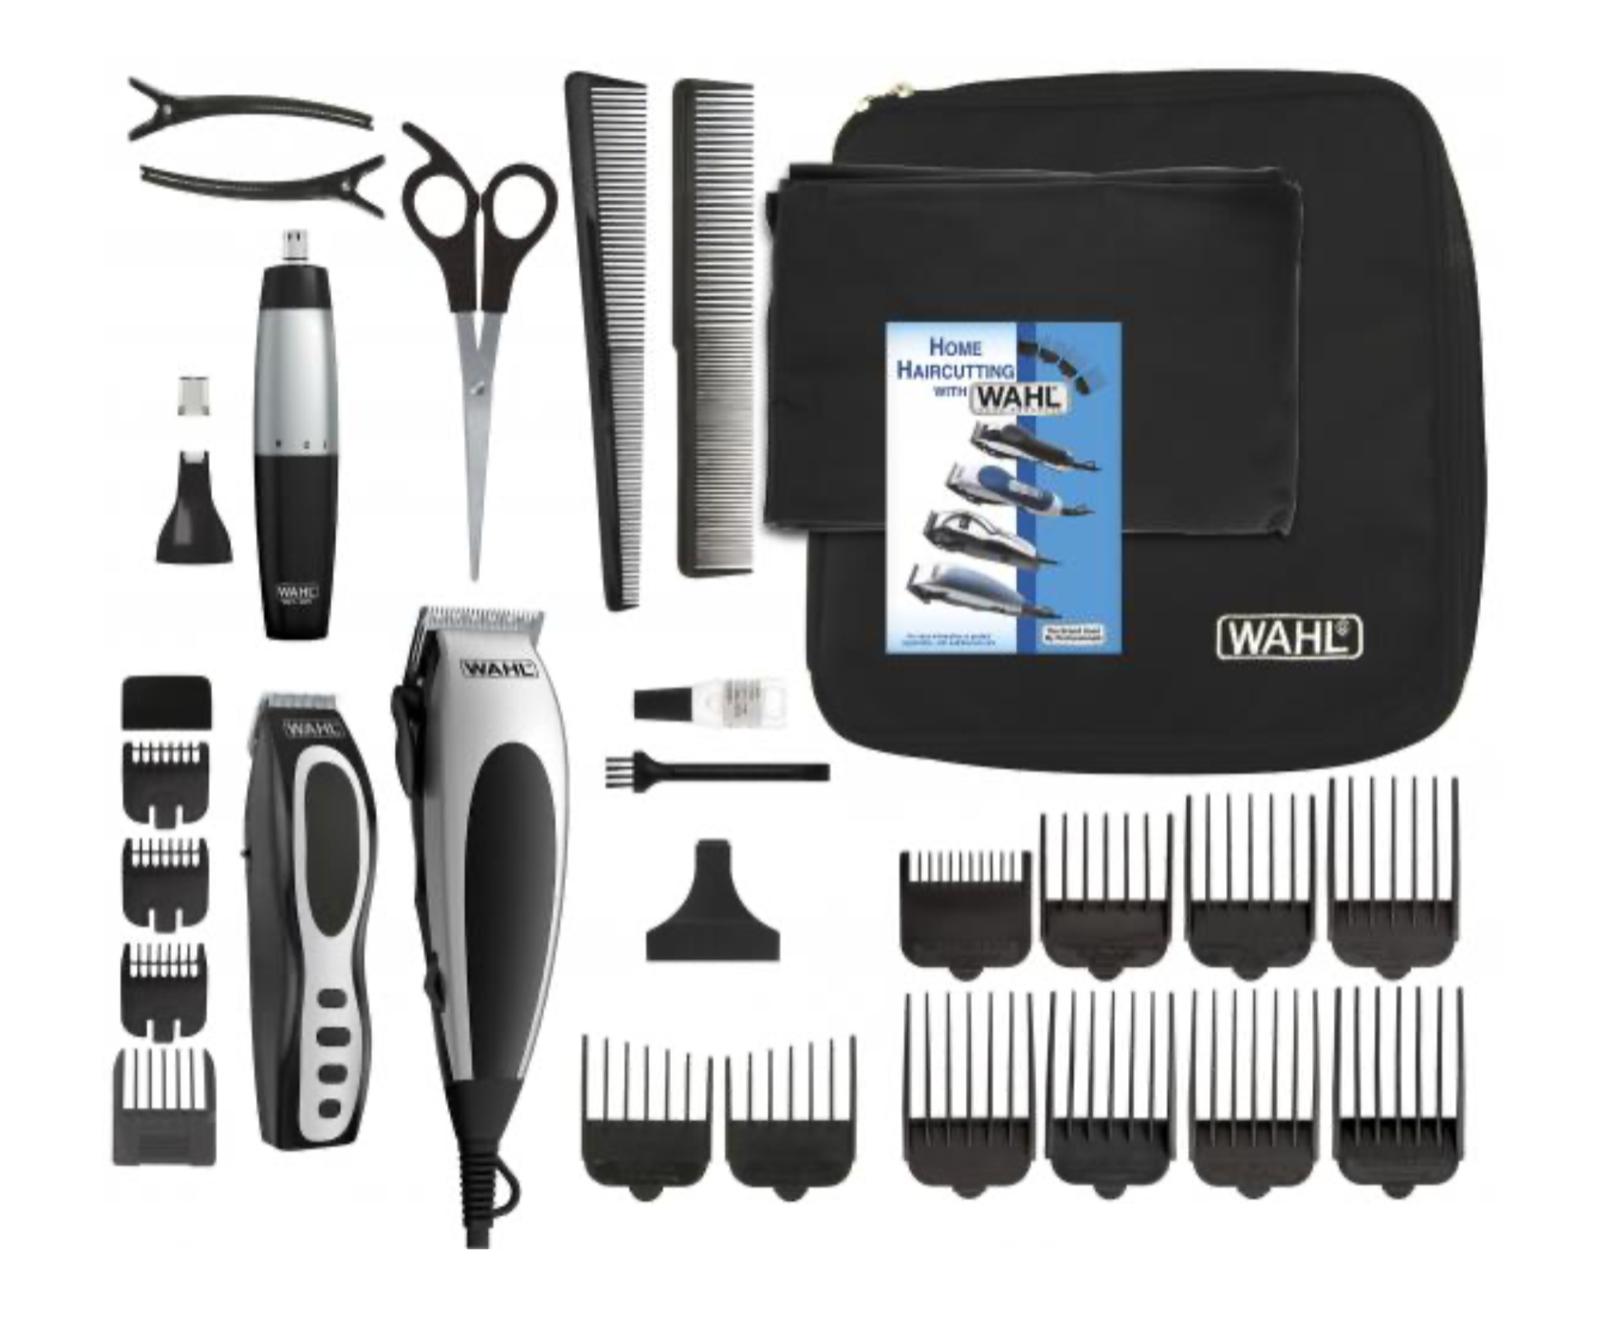 30 piece hair cut home barber kit